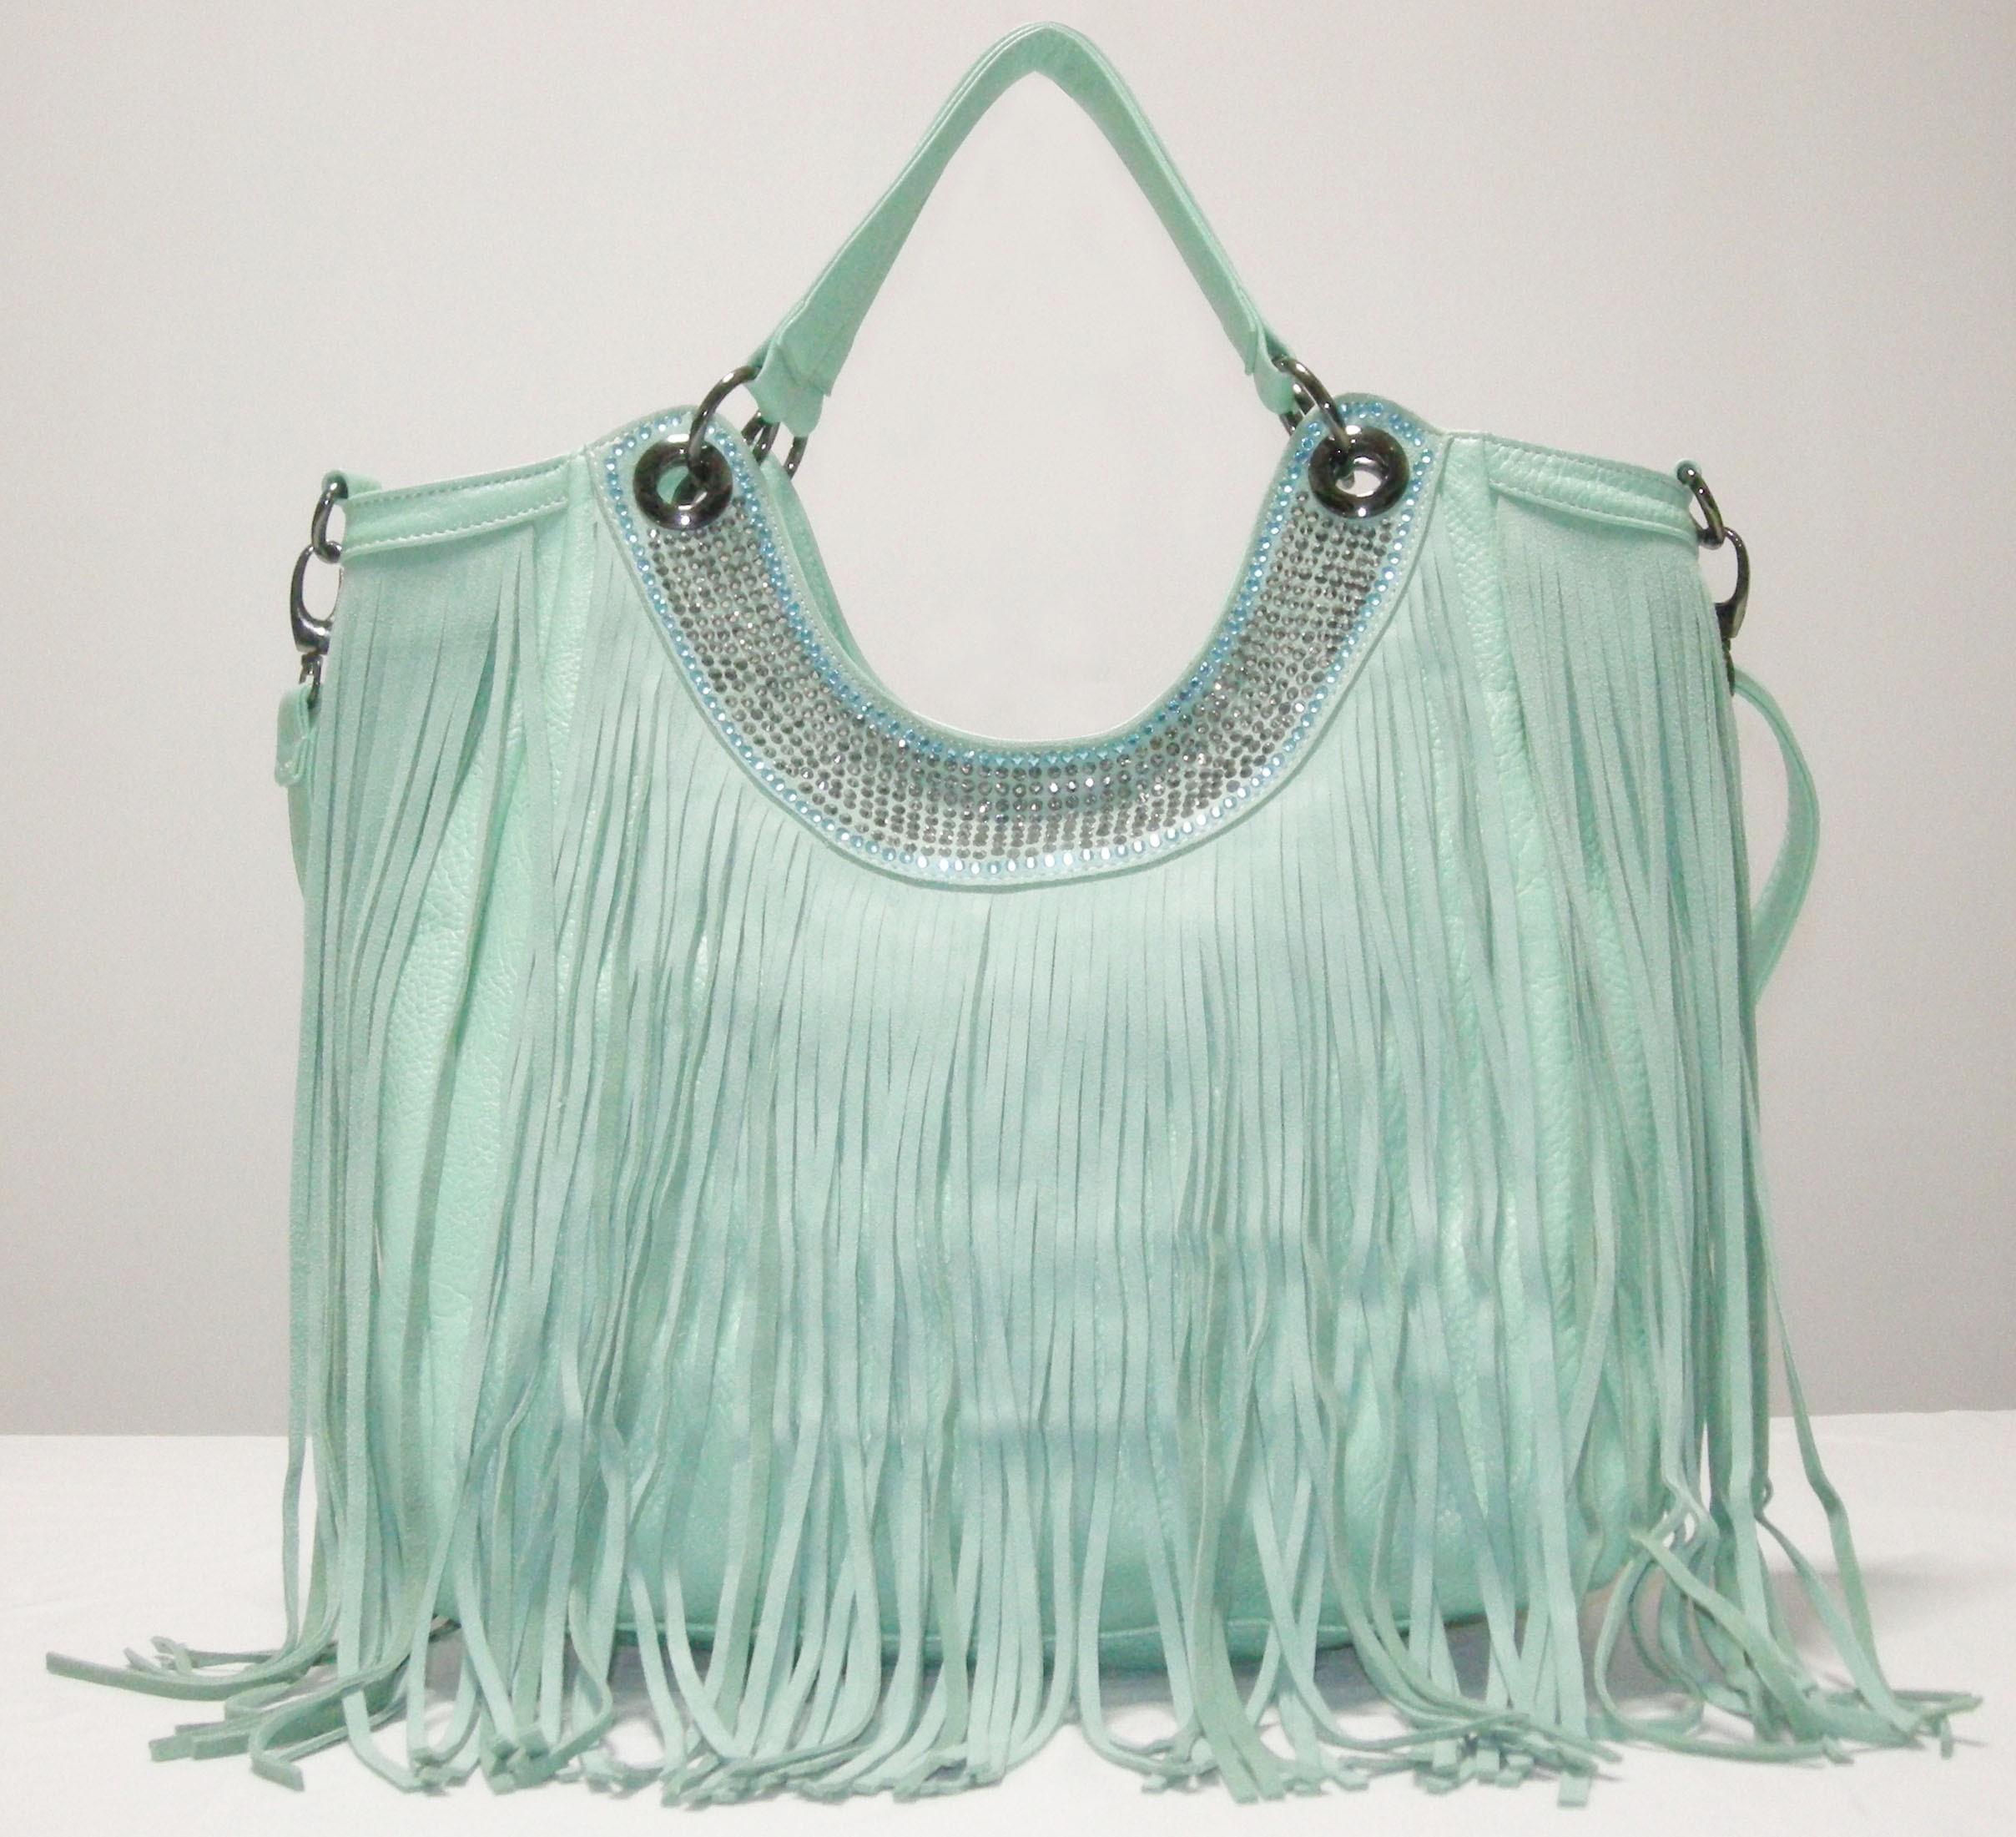 Galian Handbags: Fashionable Handbags, Totes, and Clutches from Galian Handbags